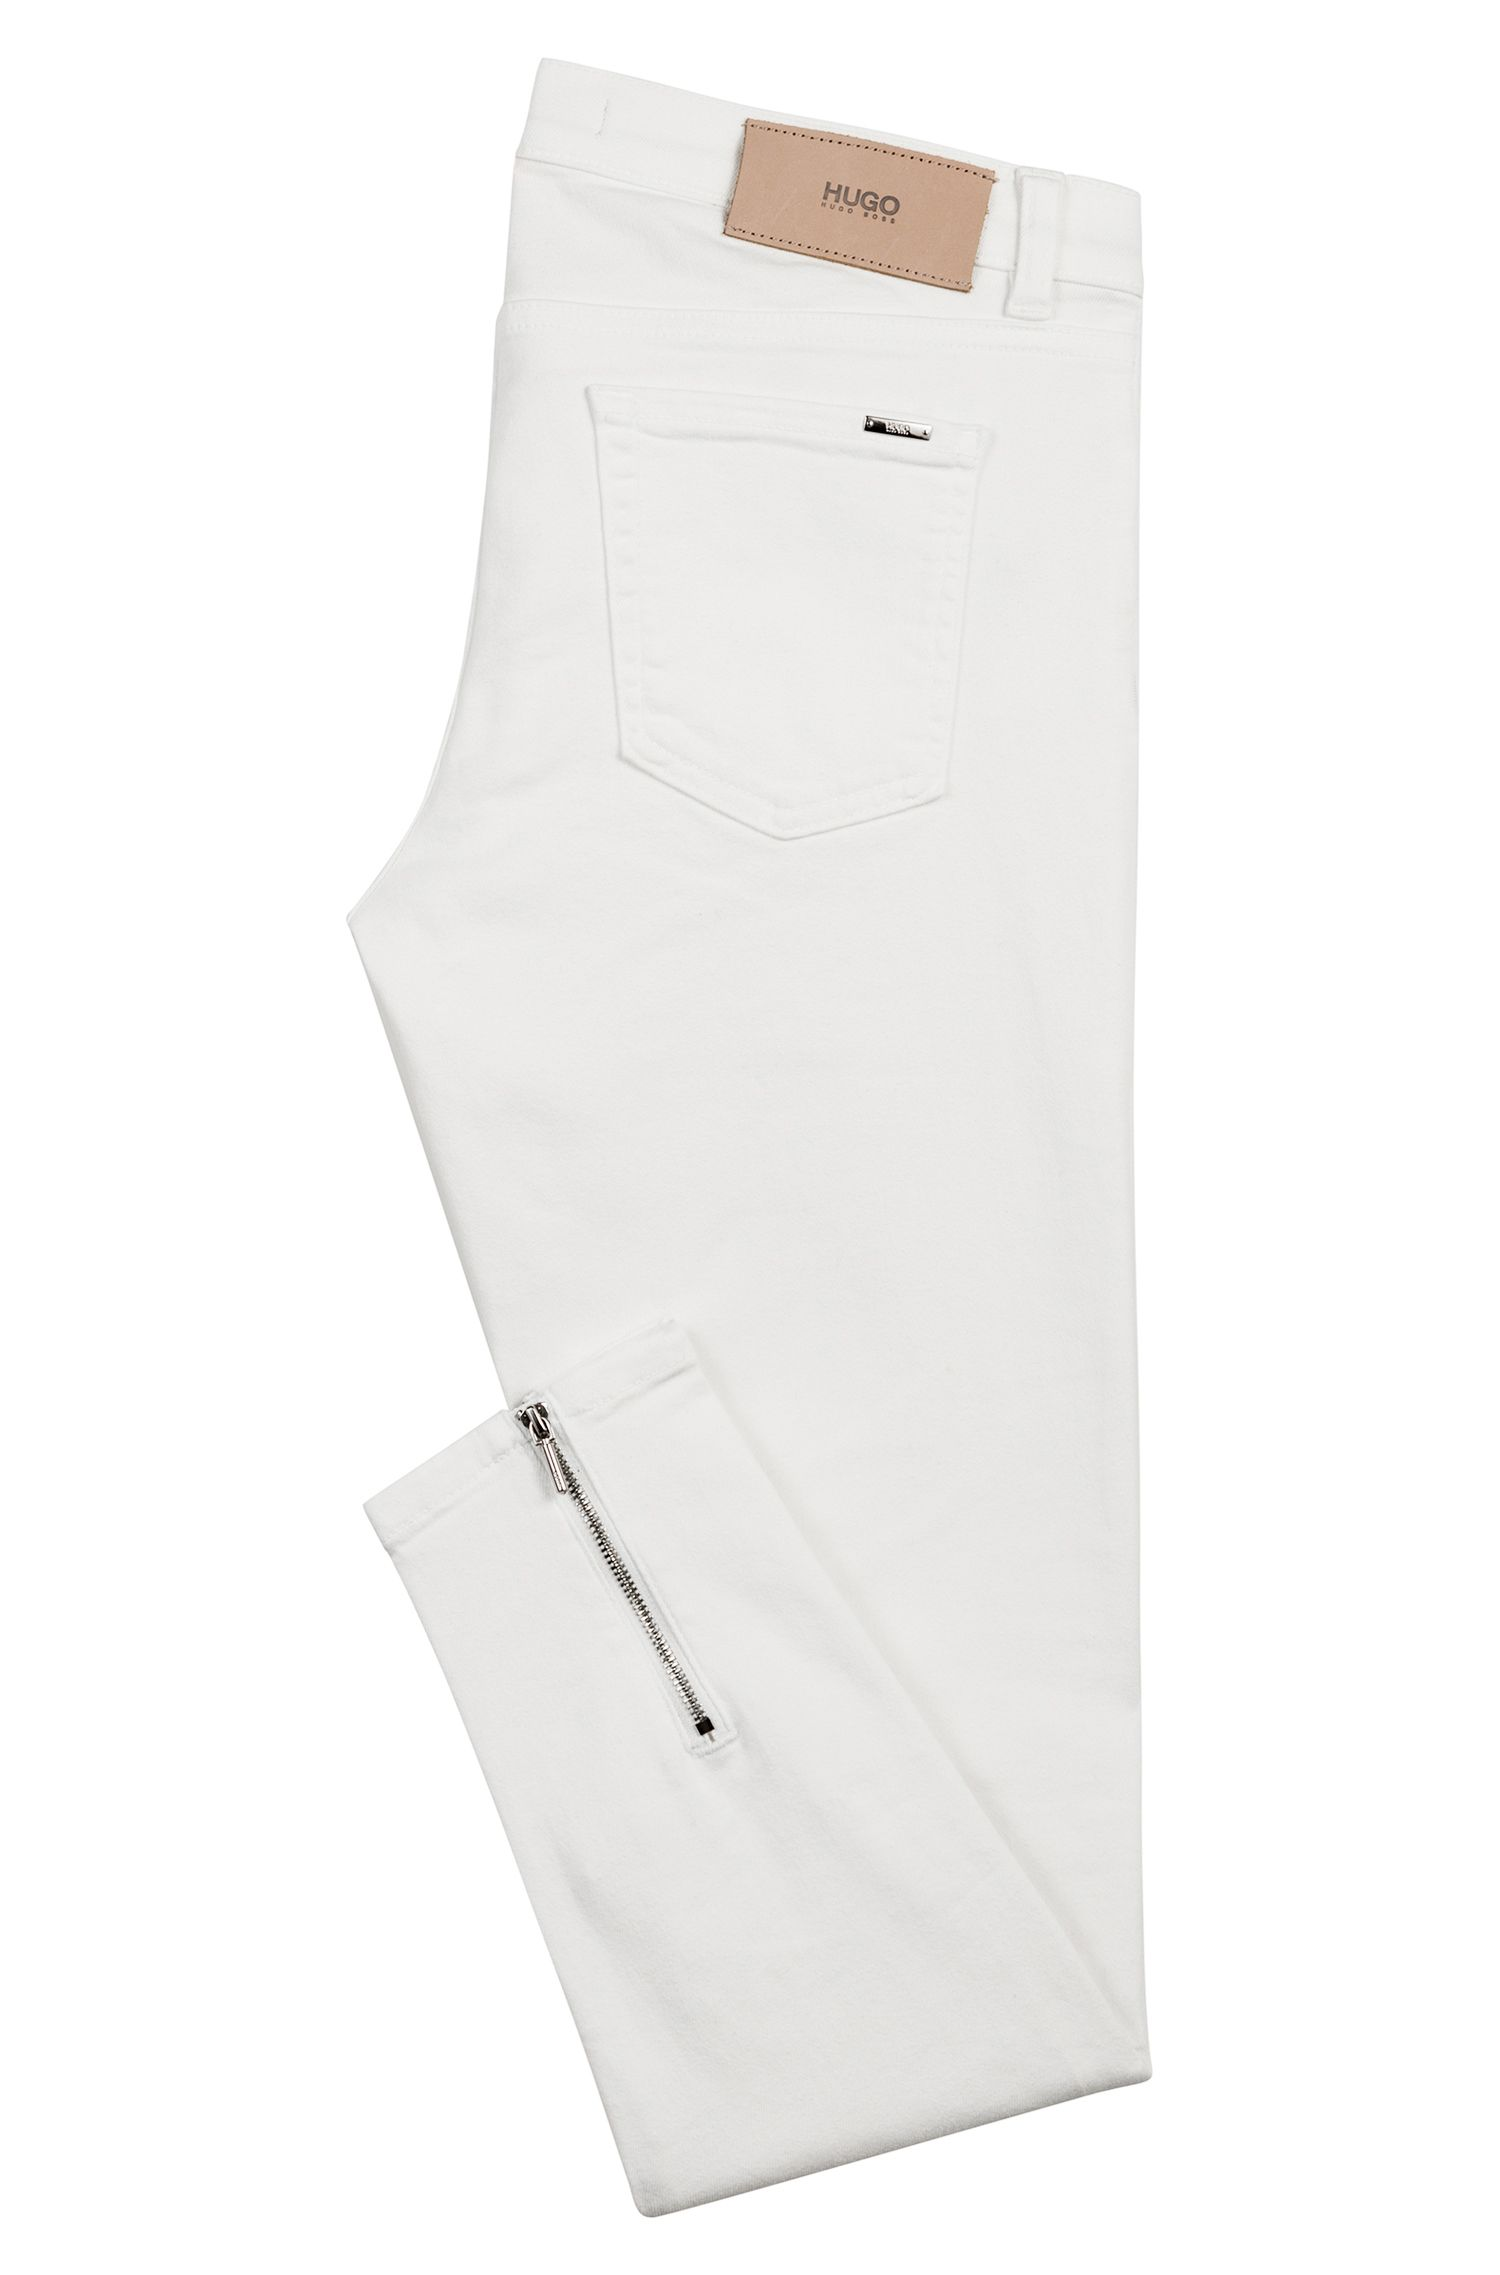 Hugo Boss - Skinny-Fit Jeans mit Reißverschlüssen hinten am Saum - 4